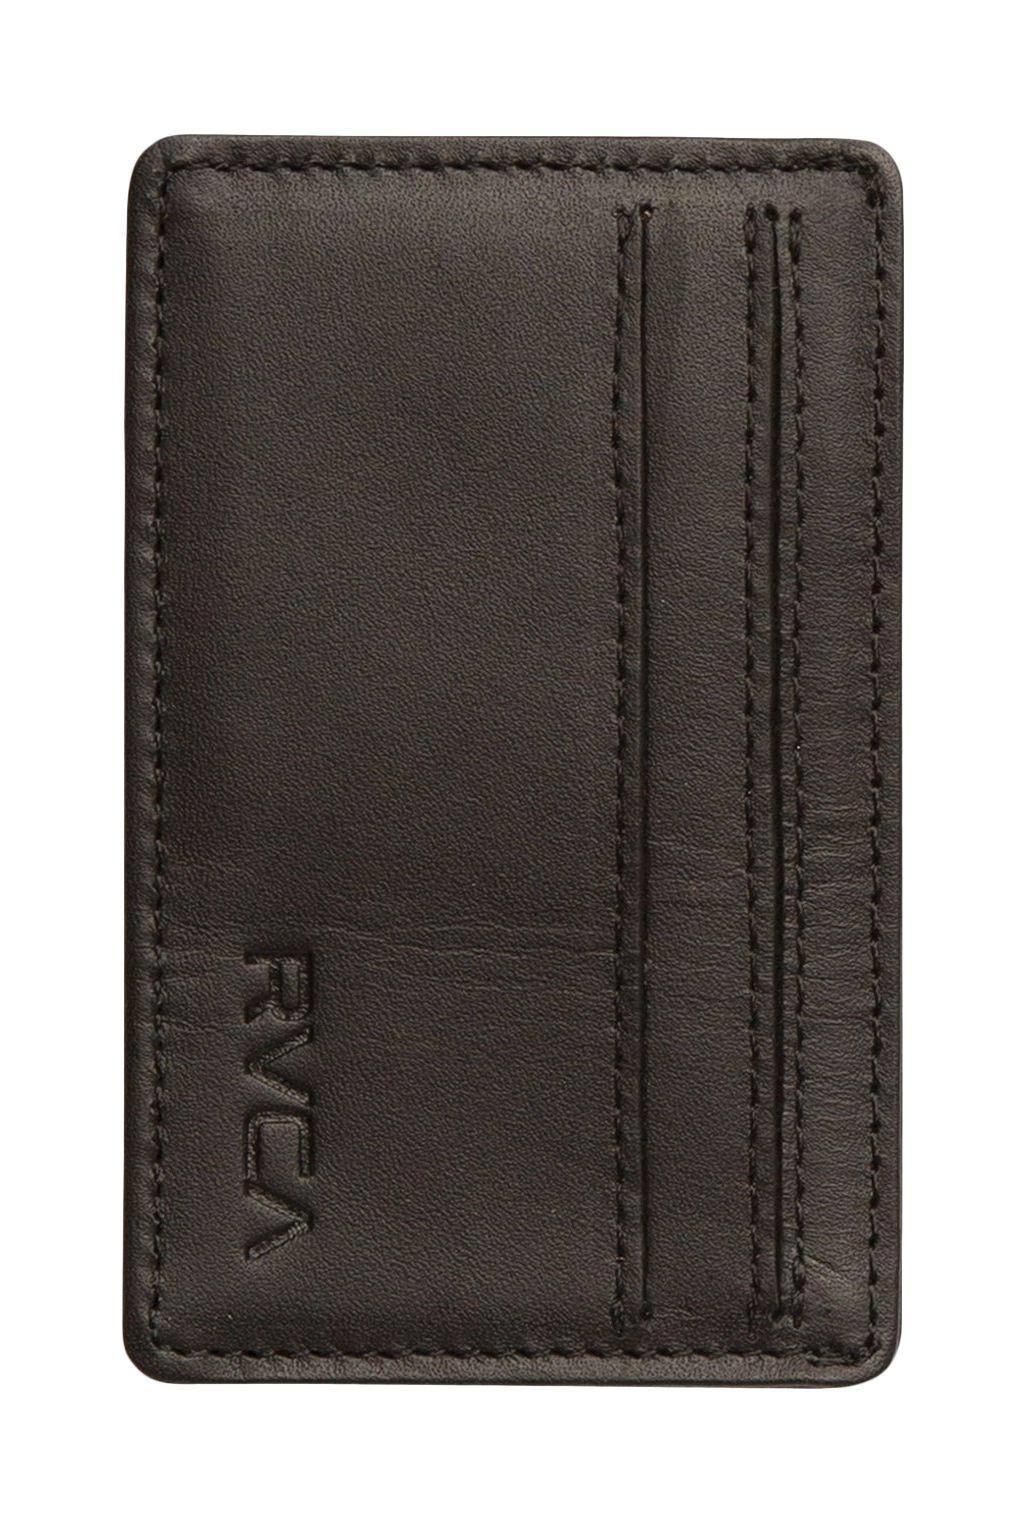 Carteira Pele RVCA CLEAN CARD WALLET Black